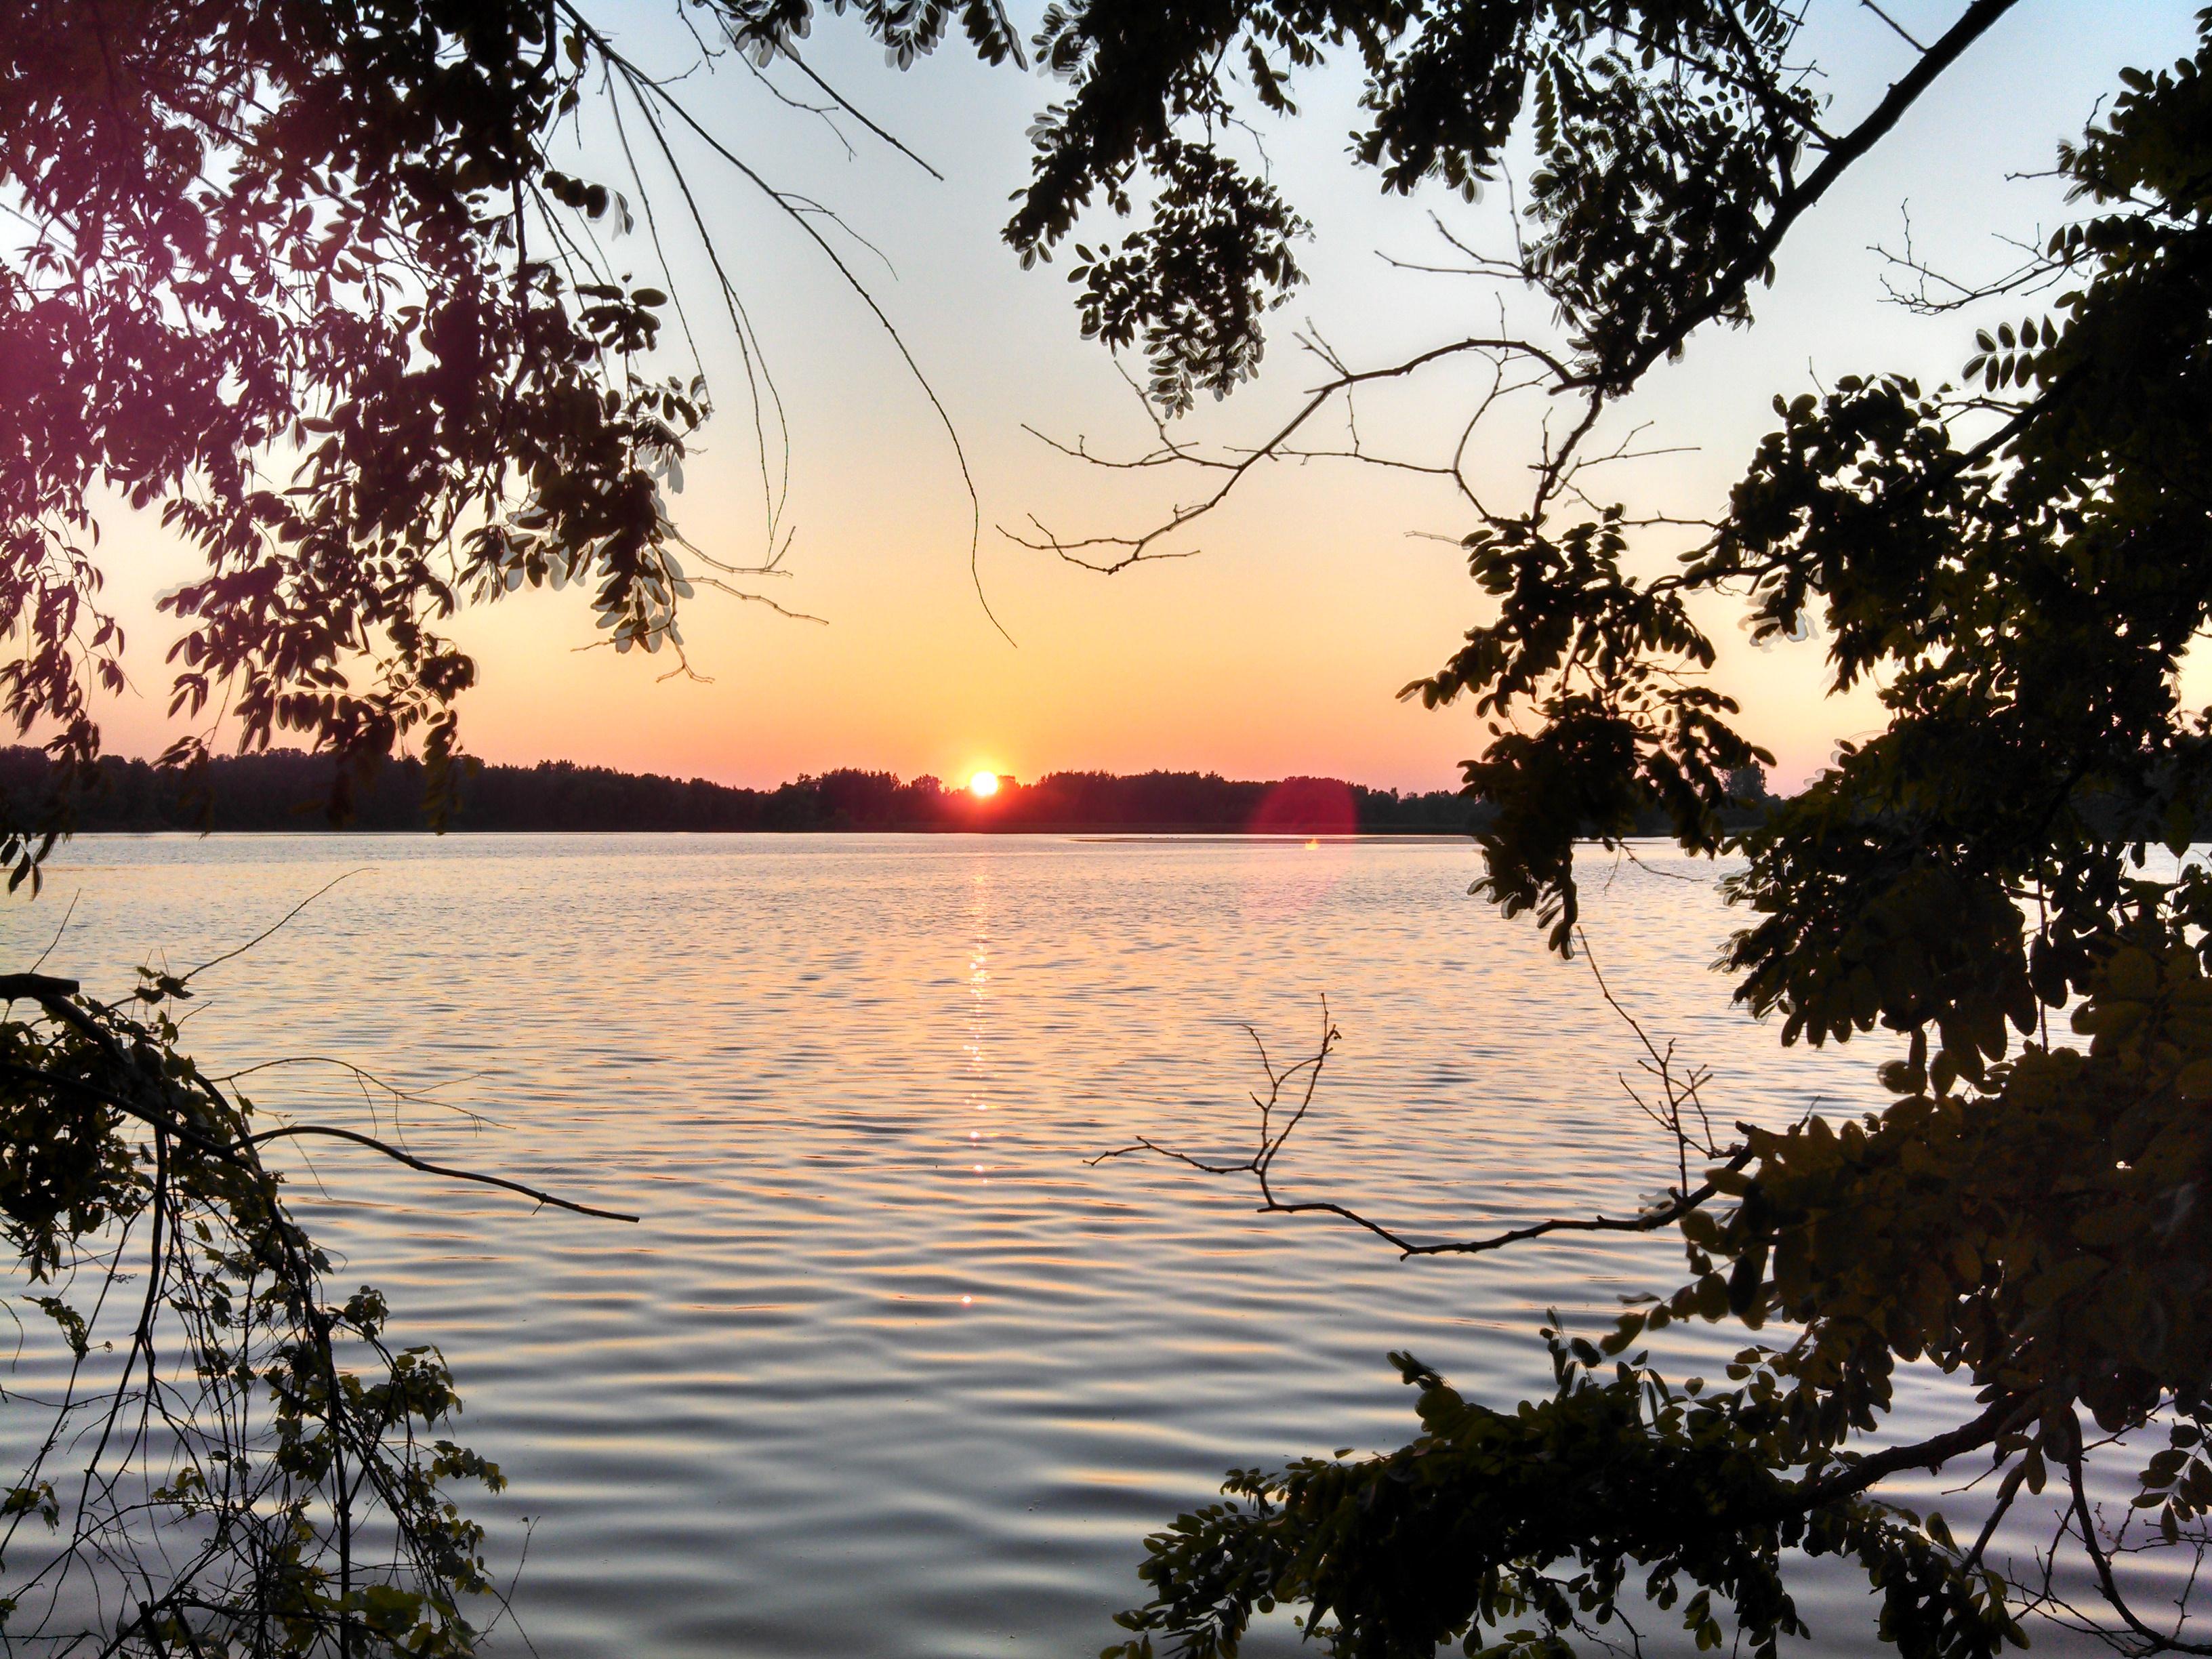 Sun on the Horizon Over Lake Ovid